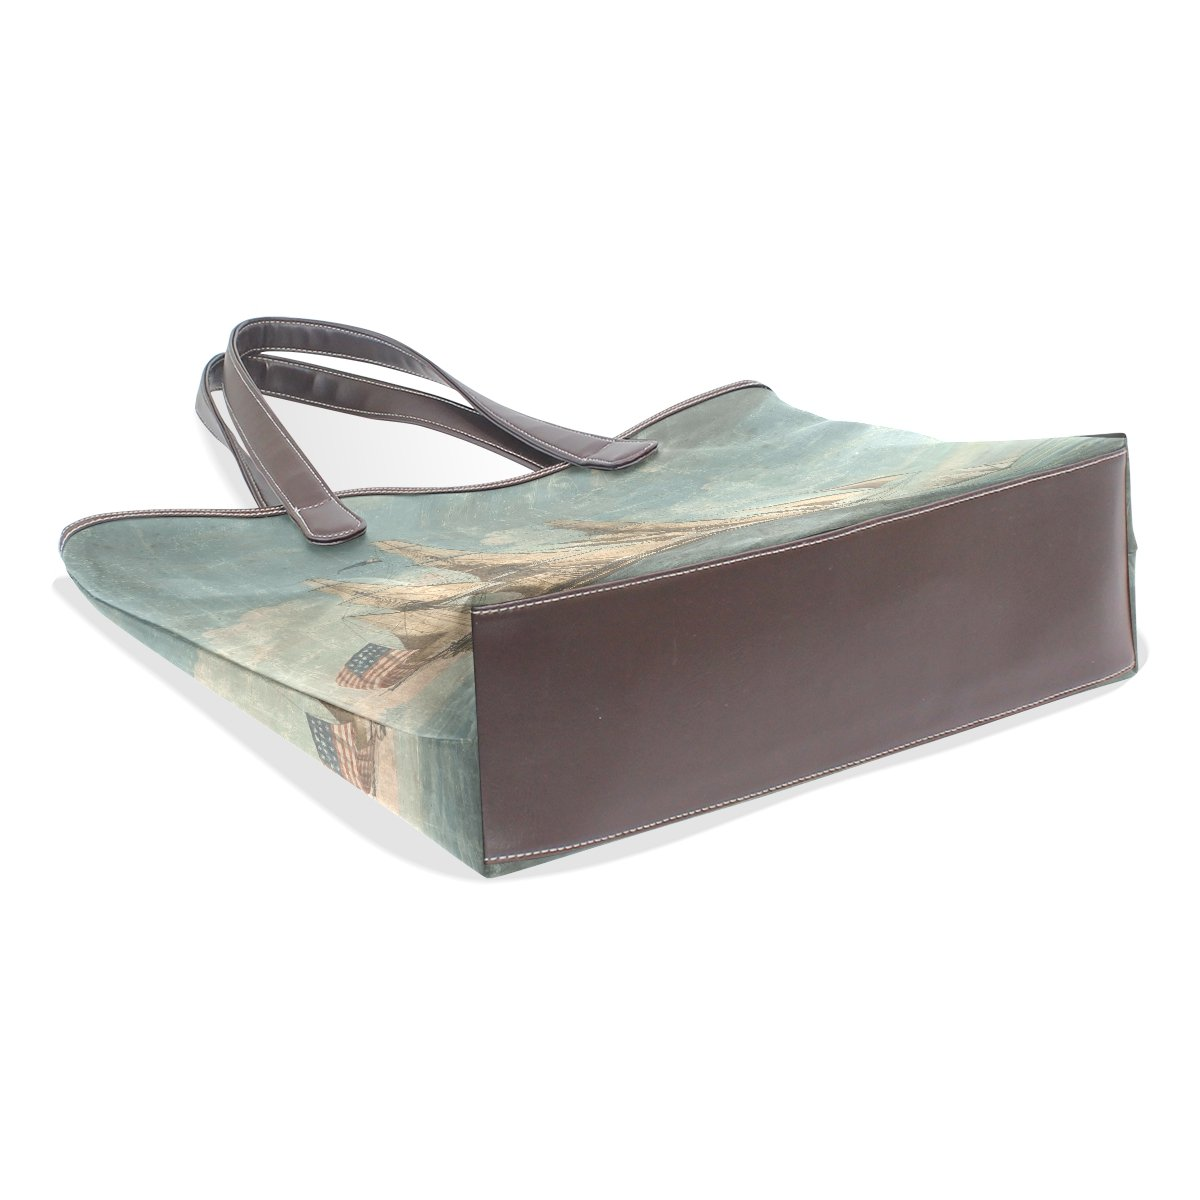 Ye Store Watercolor Pirate Ship Lady PU Leather Handbag Tote Bag Shoulder Bag Shopping Bag